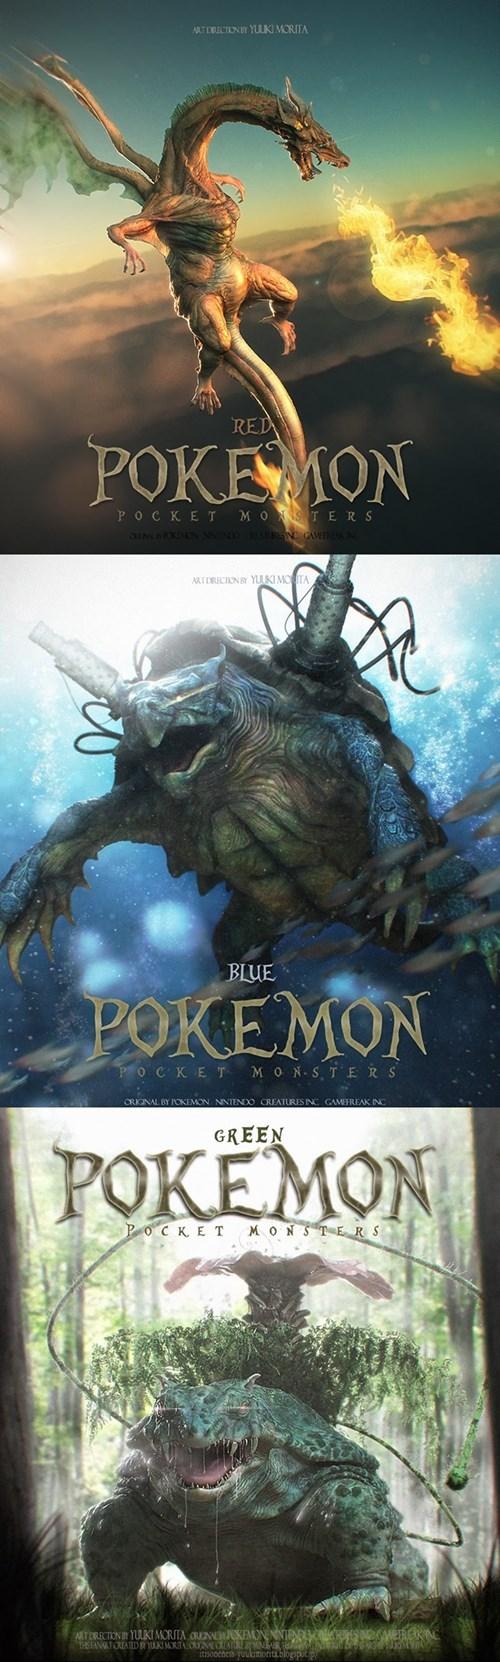 Pokémon Fan Art blastoise charizard venusaur - 7948314368